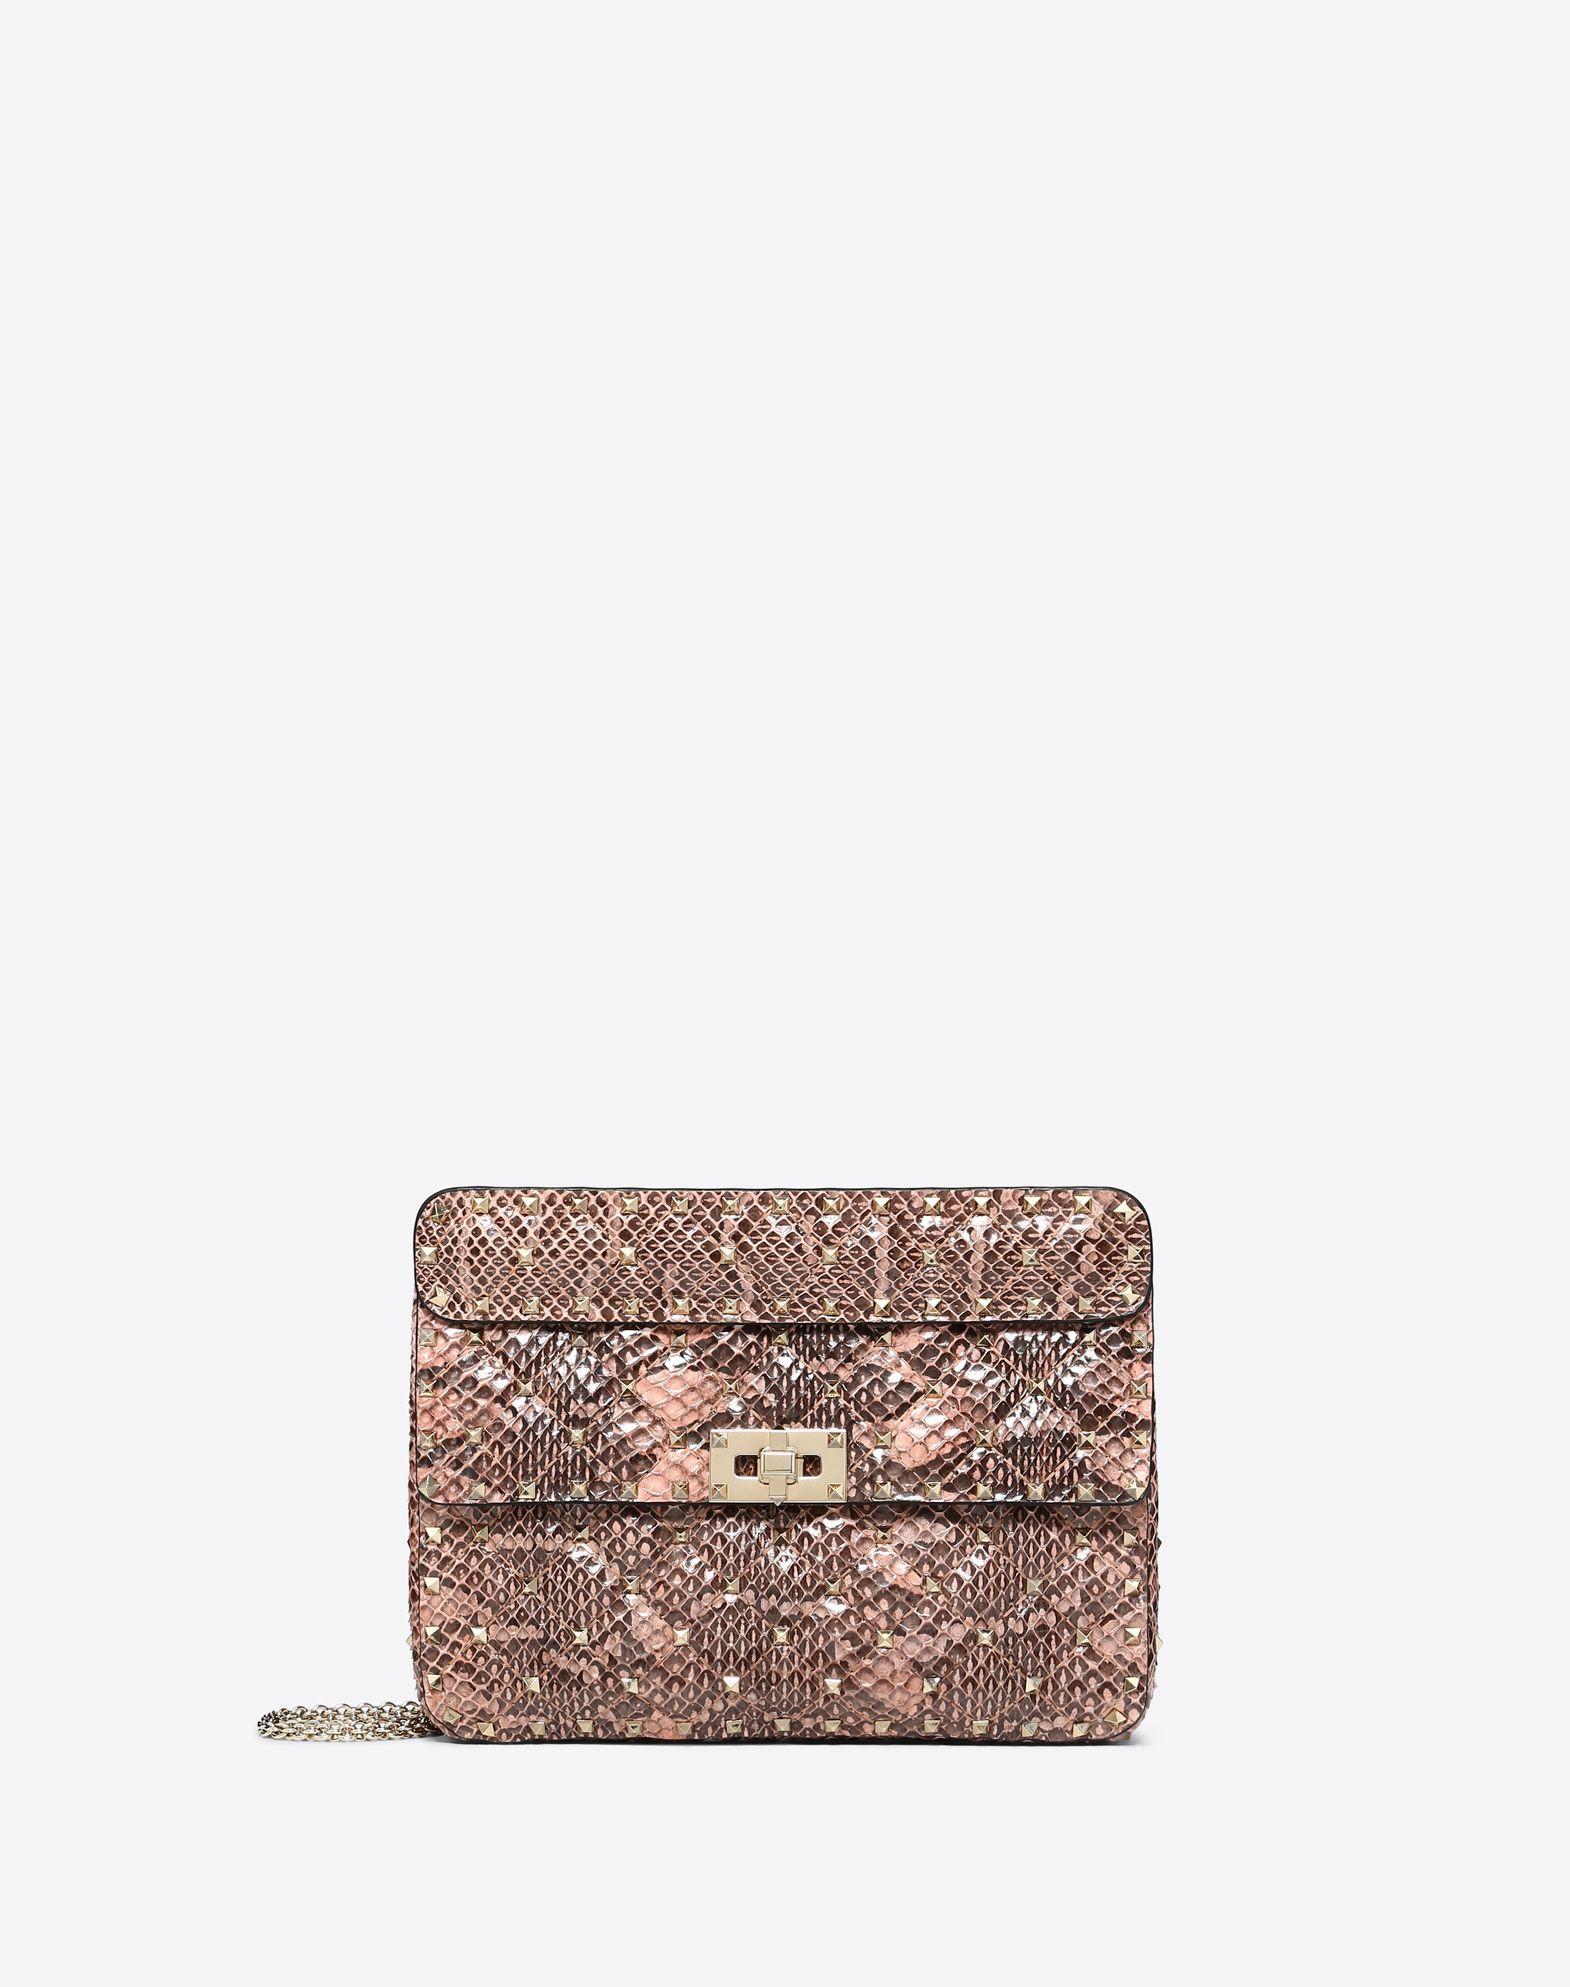 Medium Rockstud Spike Snakeskin Bag